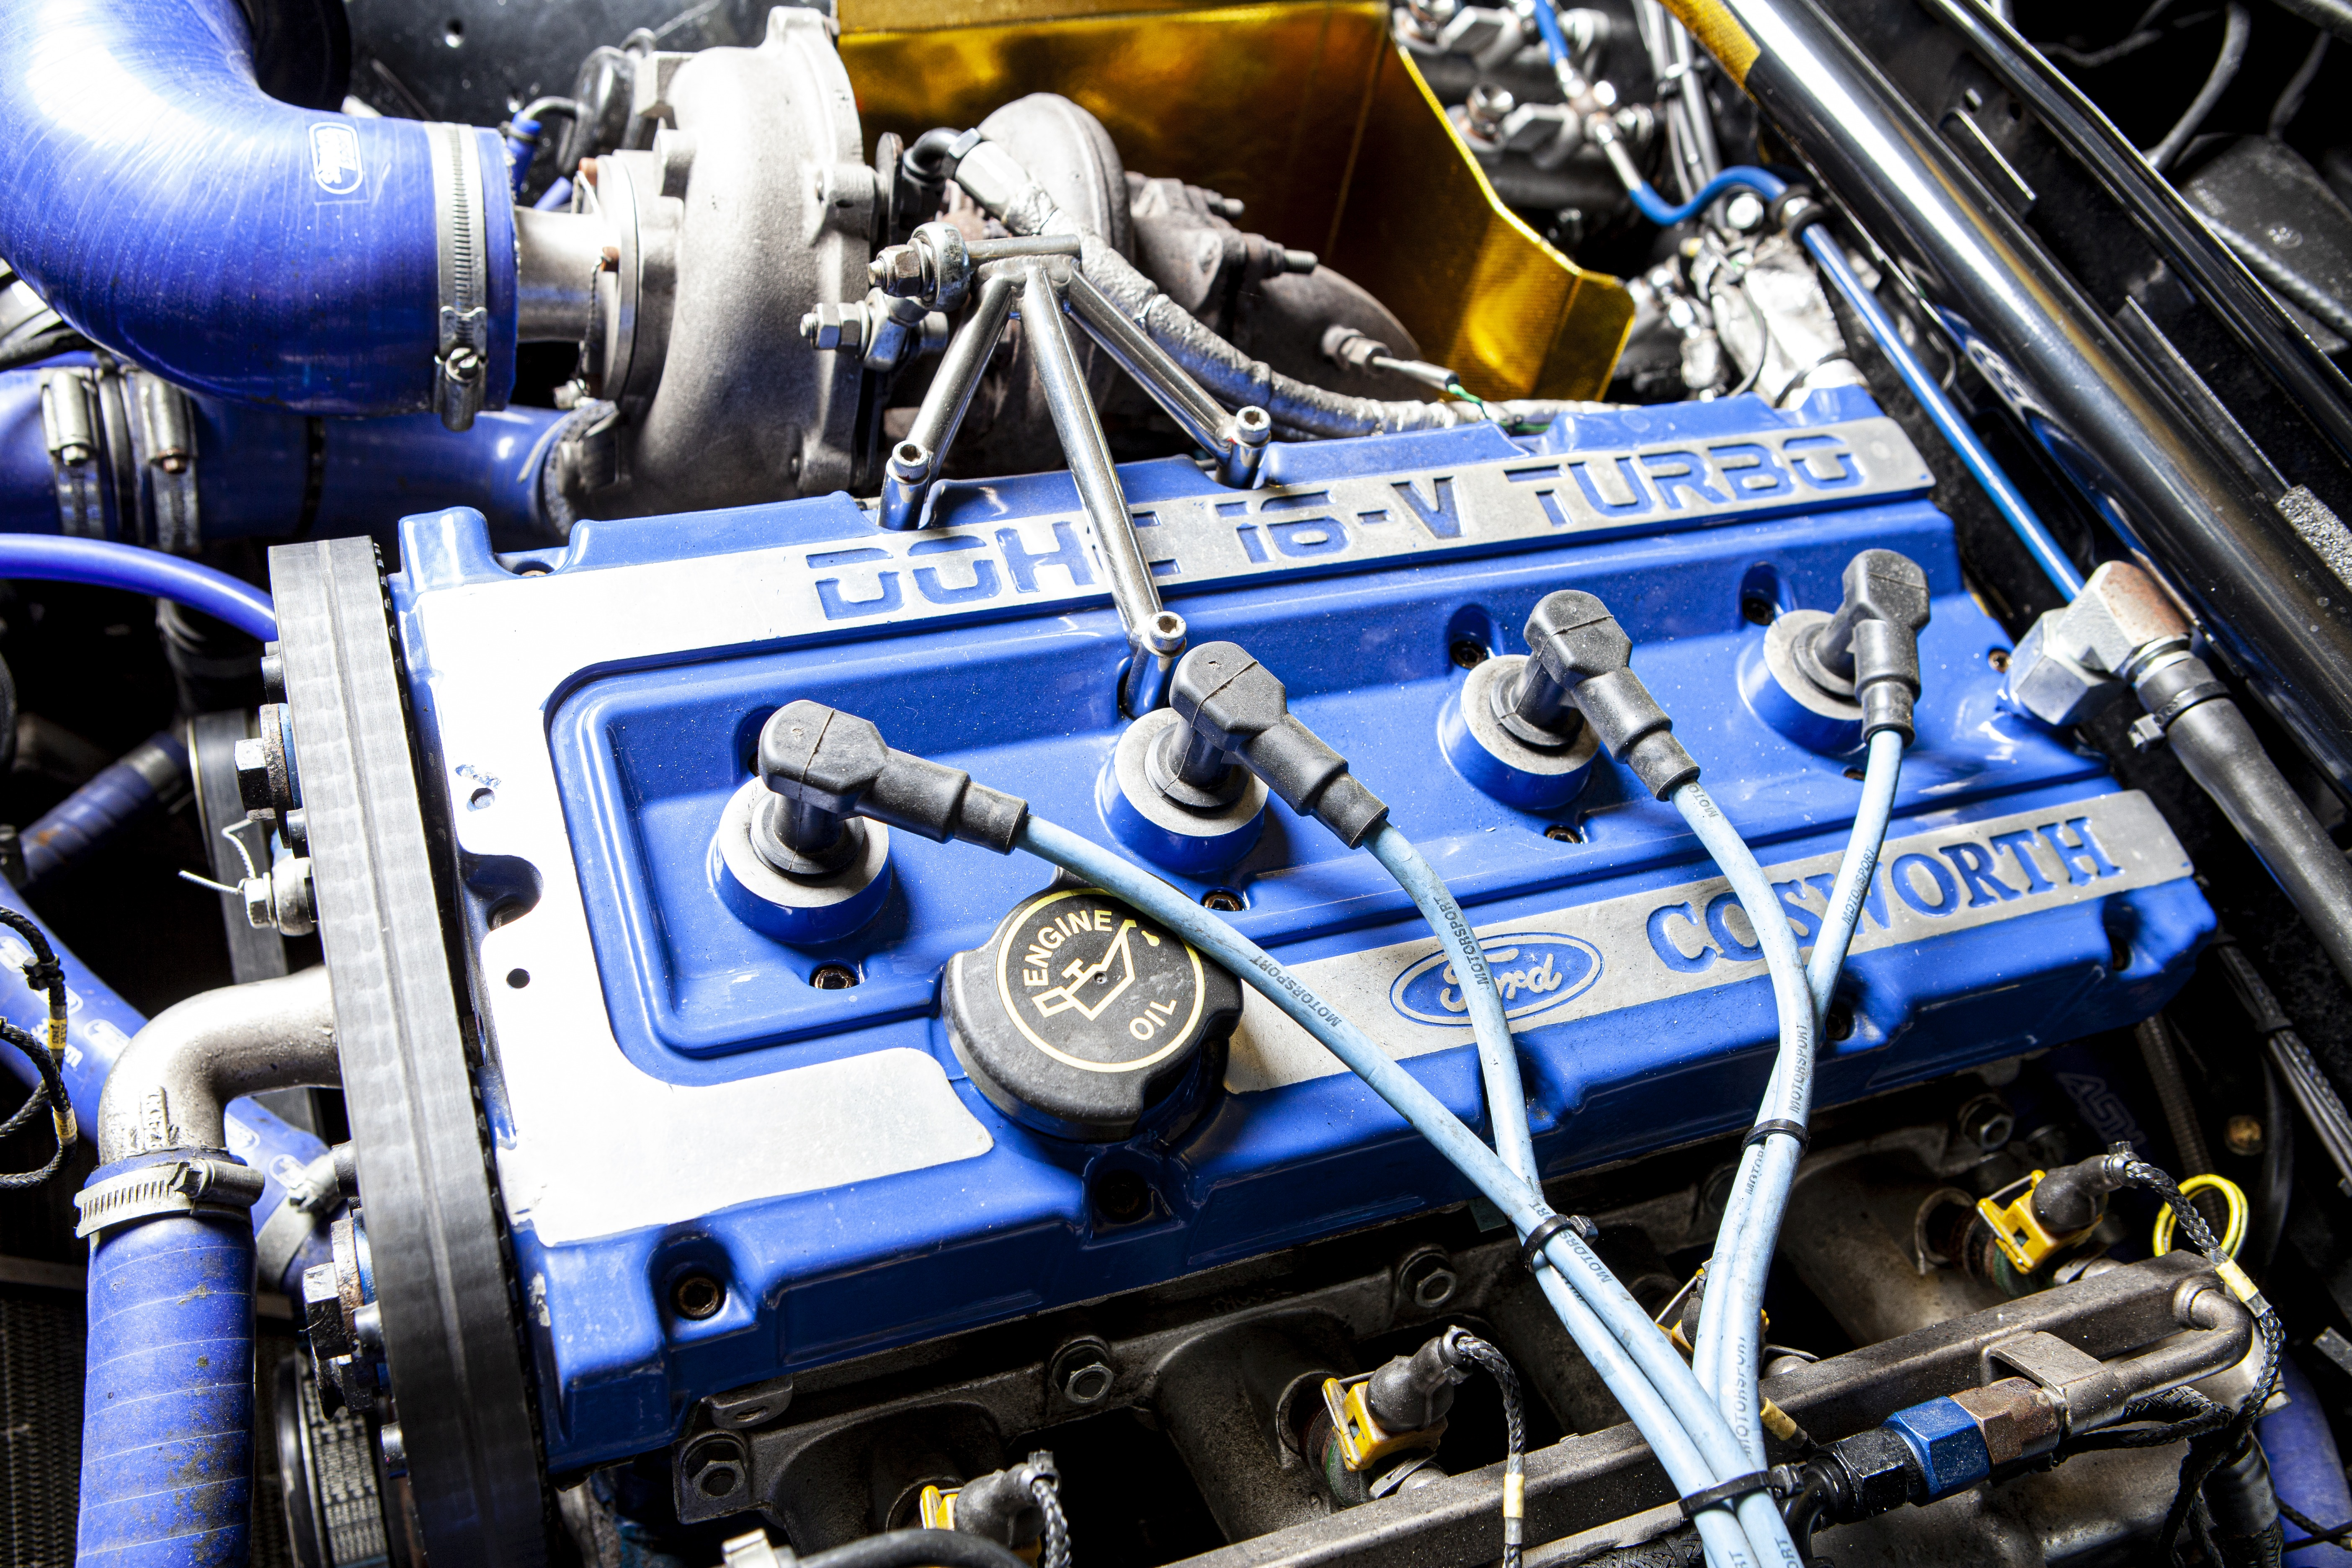 Lot 66 - 1990 Ford Sierra Sapphire RS Cosworth 4x4 Chassis no. WFOFXXGBBFLU56291